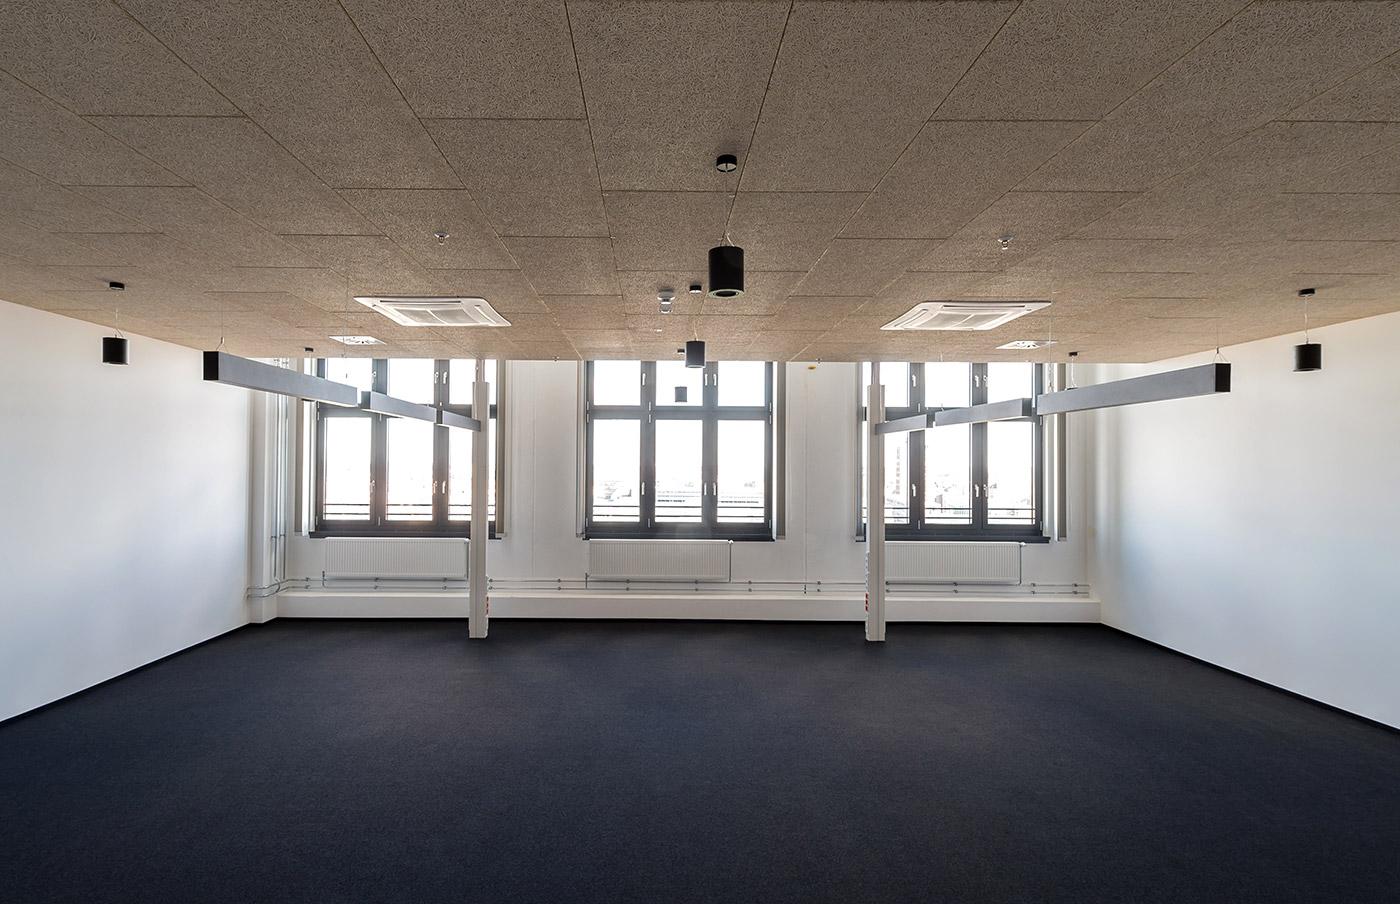 Sky-Dock am Borsigturm 100 - Referenzen - Beck Trockenbau GmbH